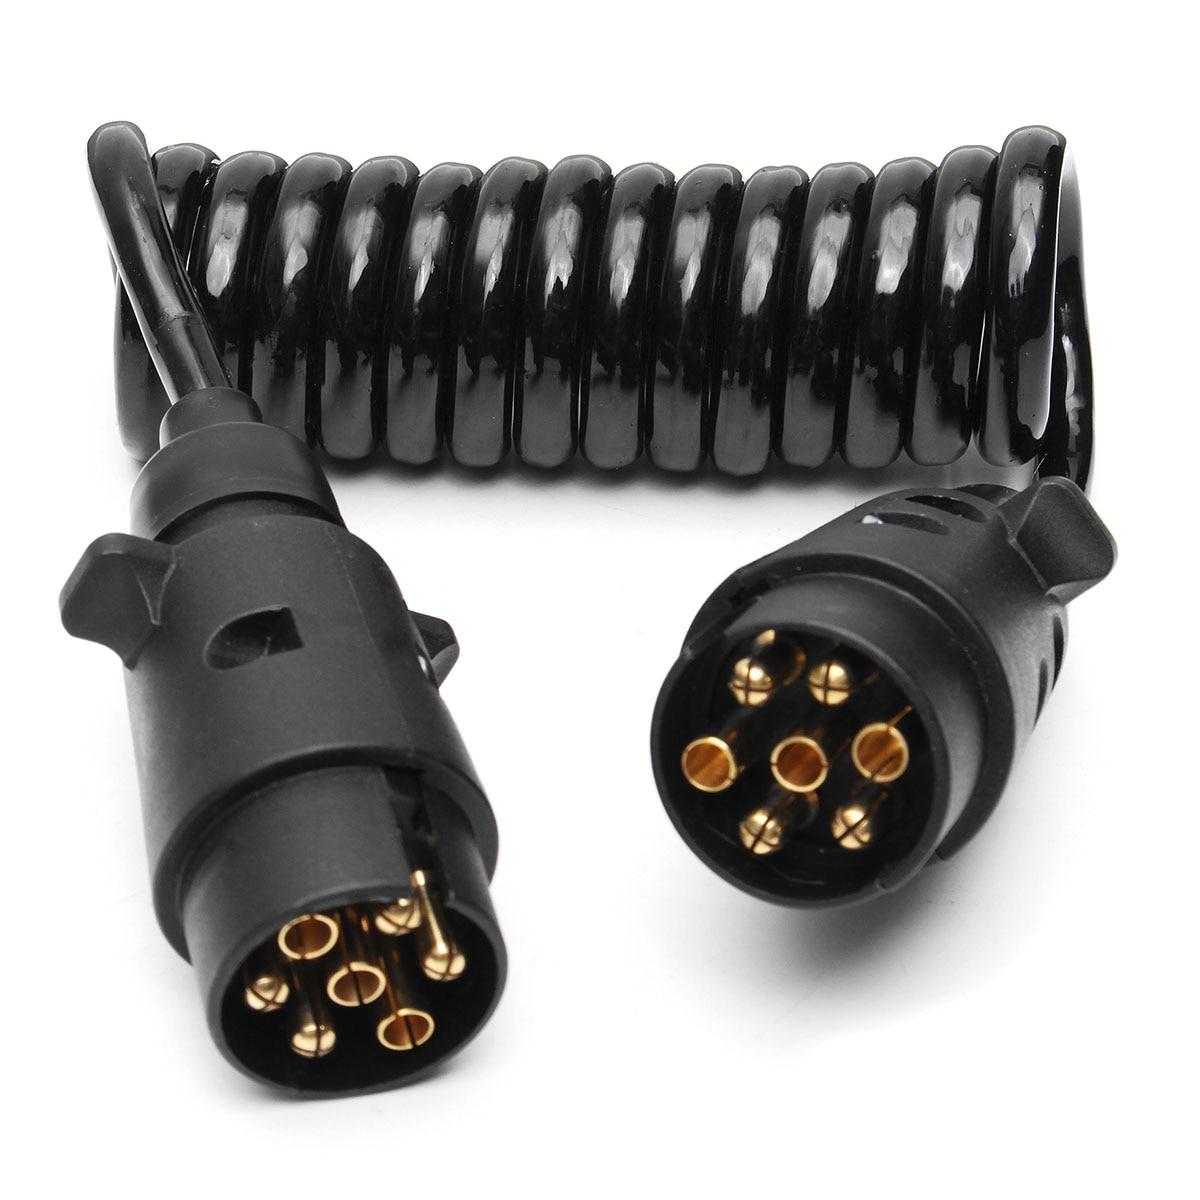 hight resolution of wiring a light board plug wiring diagram for you wiring a light board plug wiring a light board plug